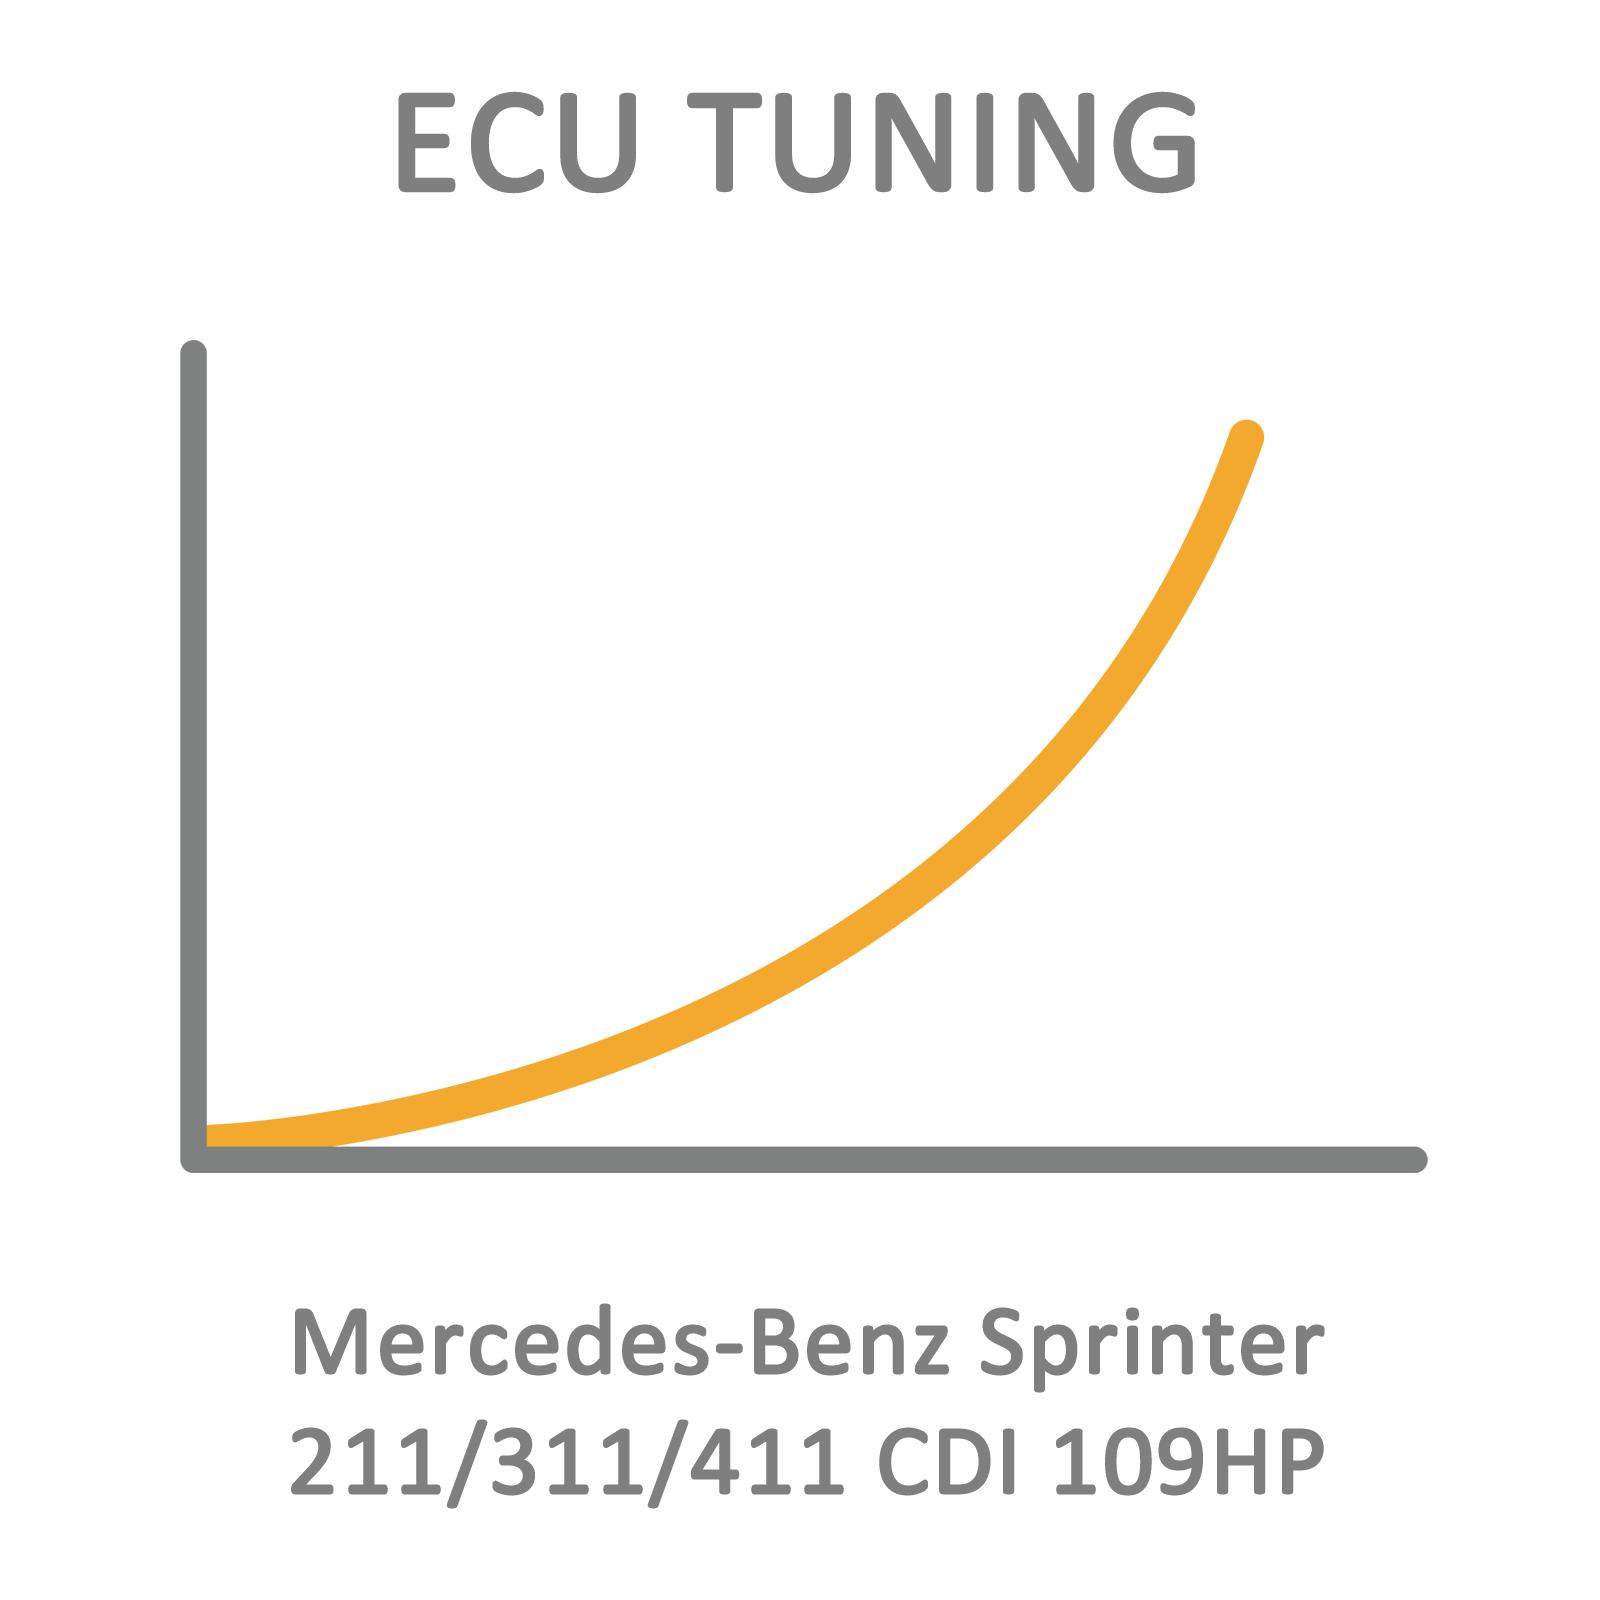 Mercedes-Benz Sprinter 211/311/411 CDI 109HP ECU Tuning